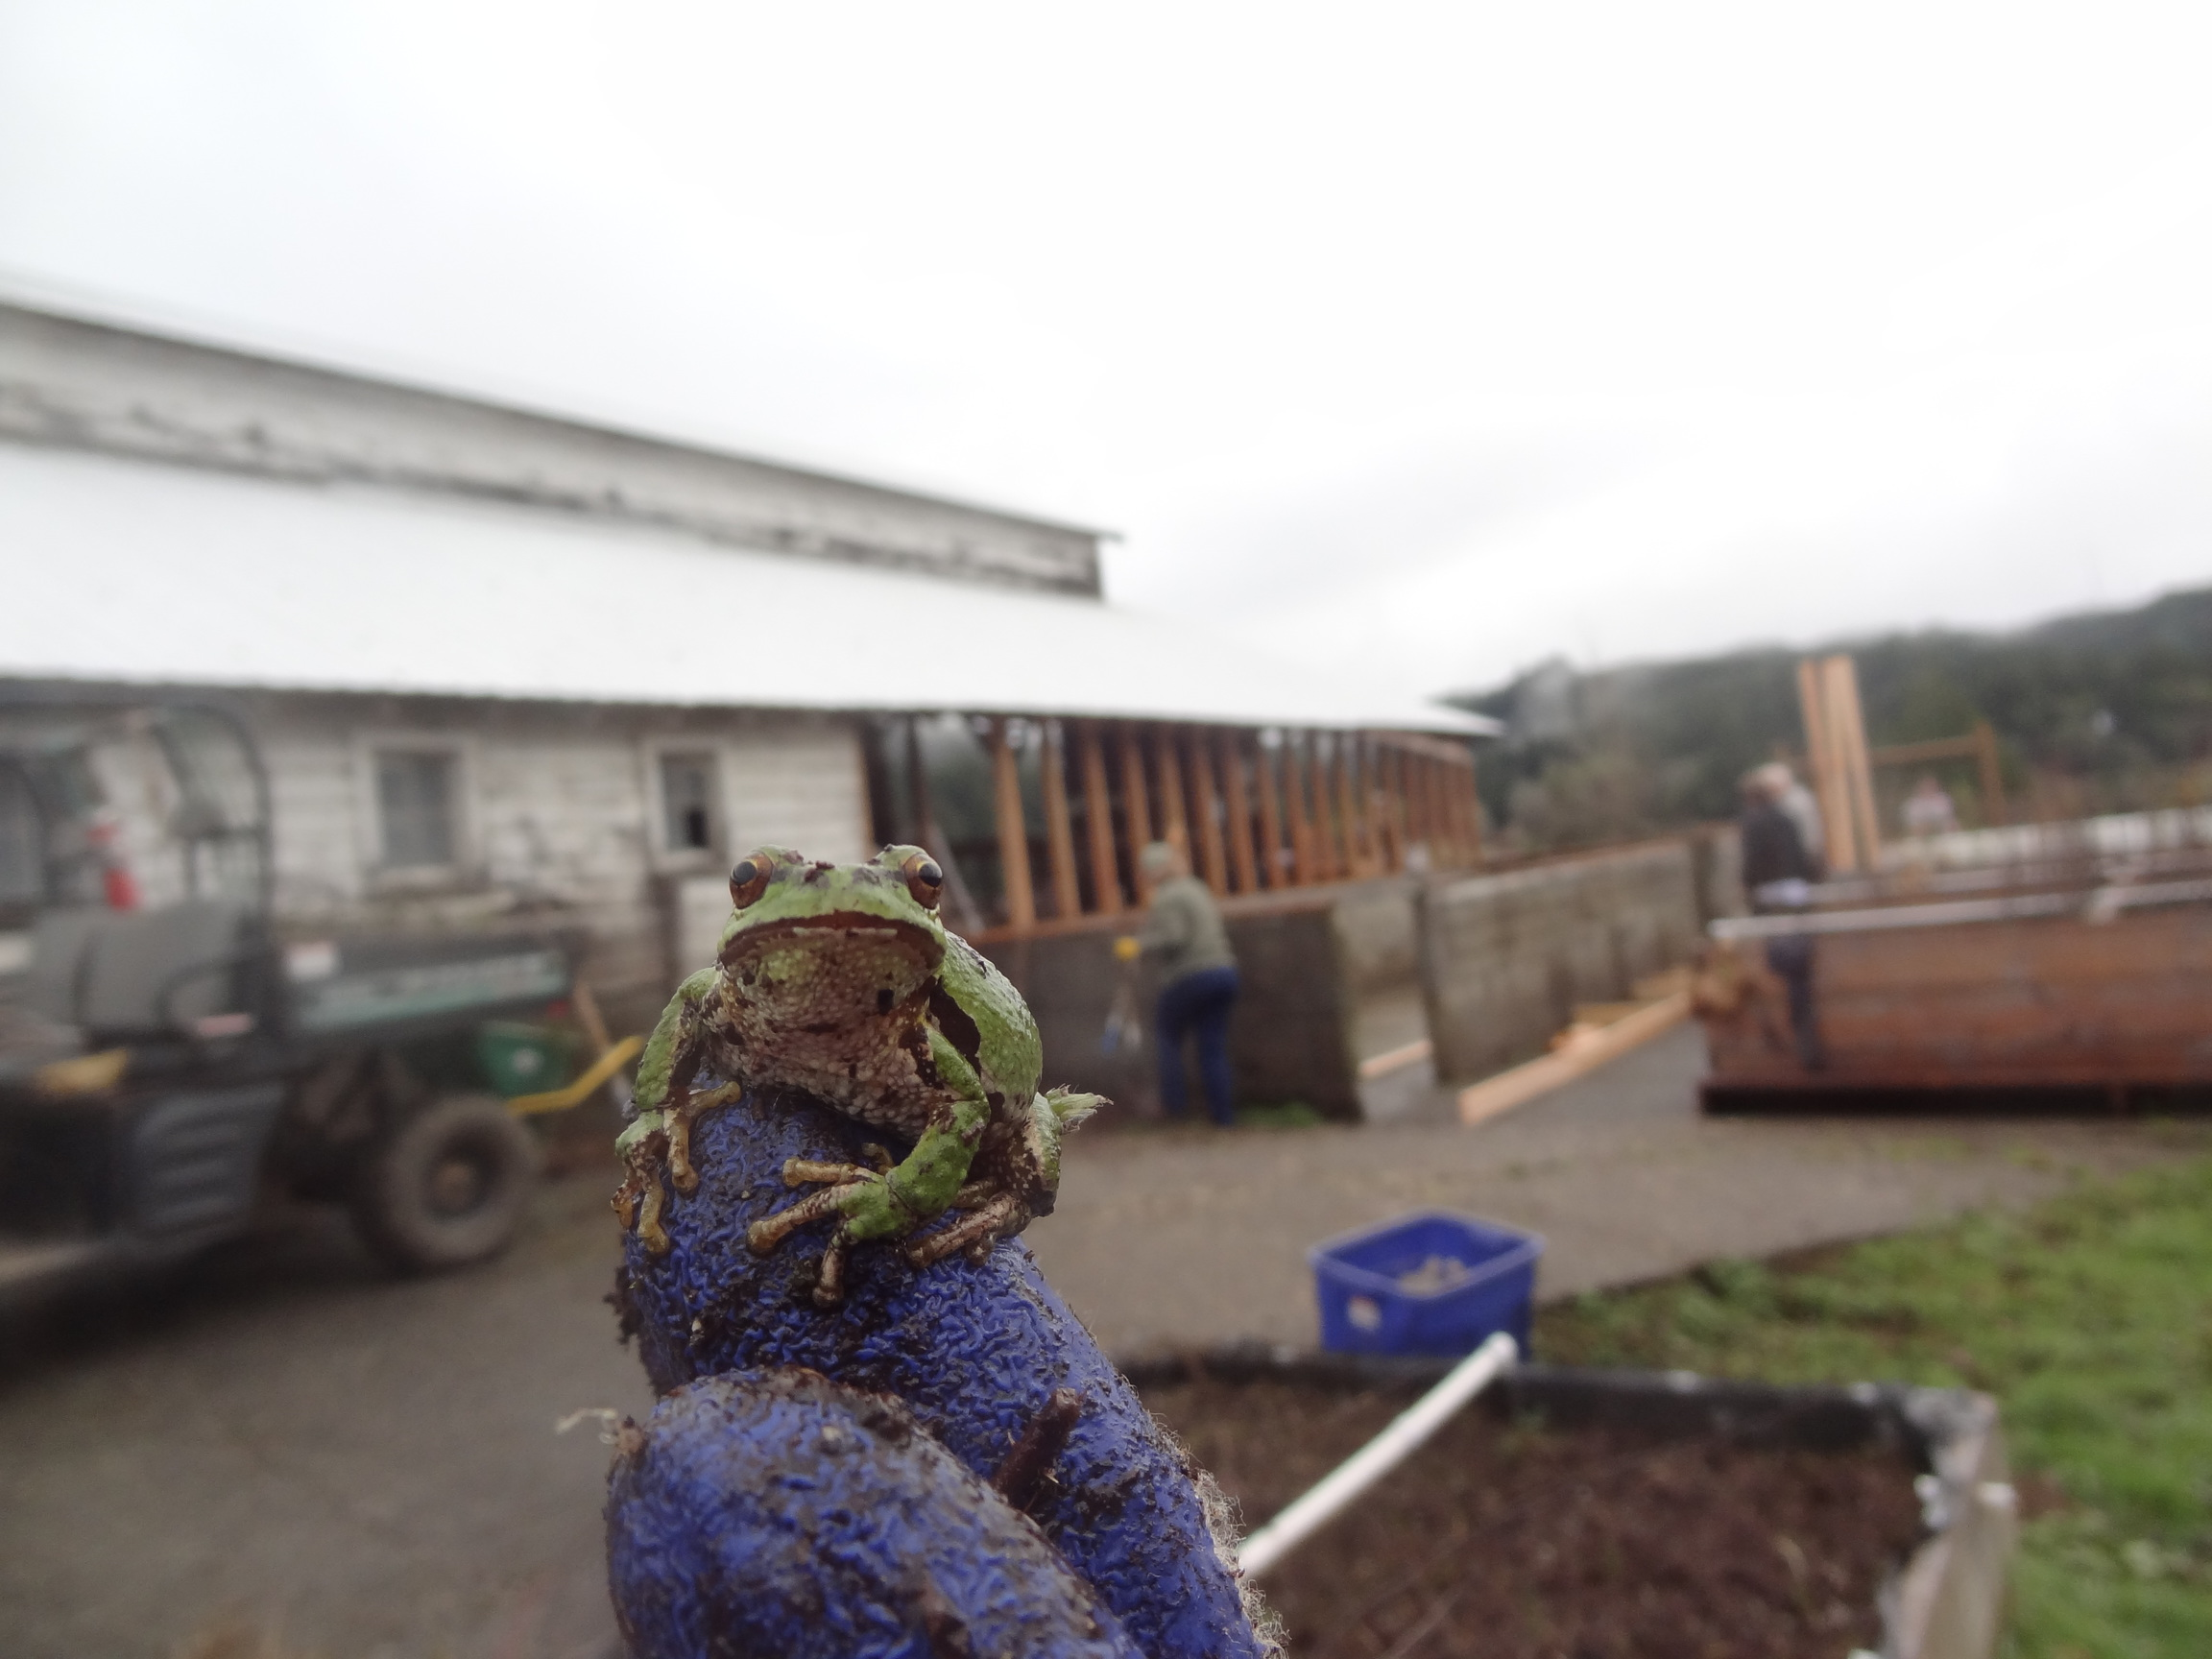 Matson tree frog greenhouse construction 2016JPG